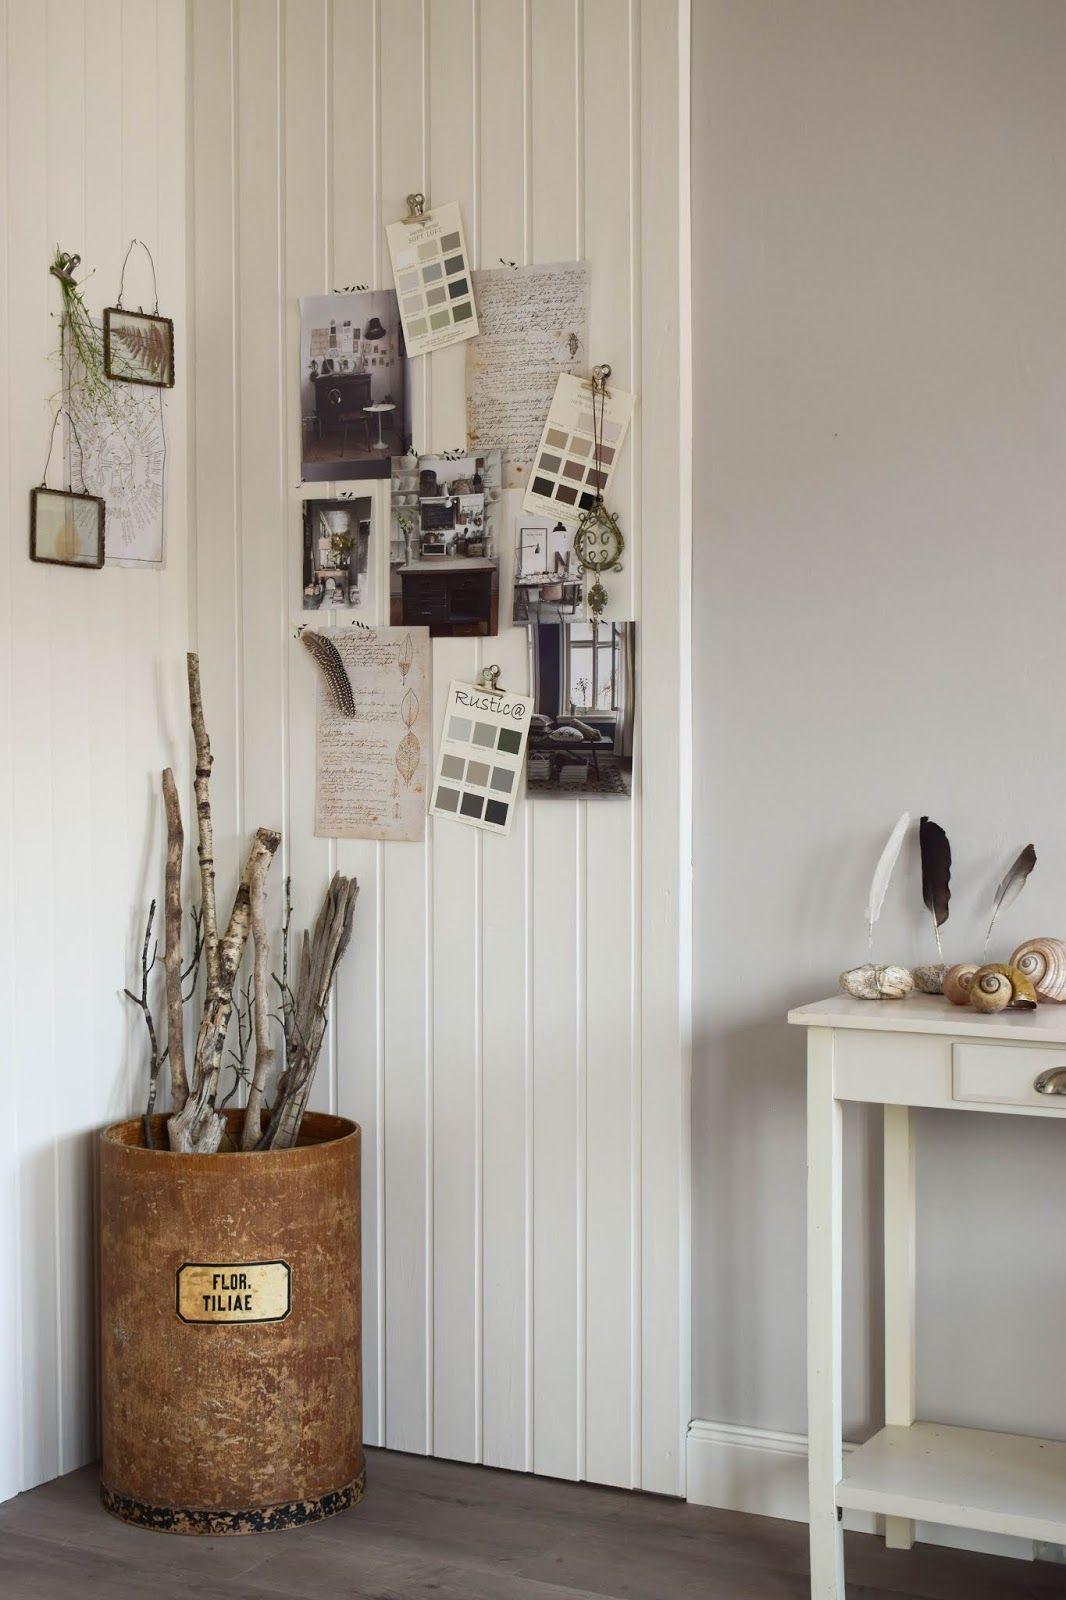 Schon Dekoidee Wandverkleidung DIY Aus Holz Moodboard Inspirationswand  Kreidefarbe Von Painting The Past Vertaefelung Beadboard Selber Machen